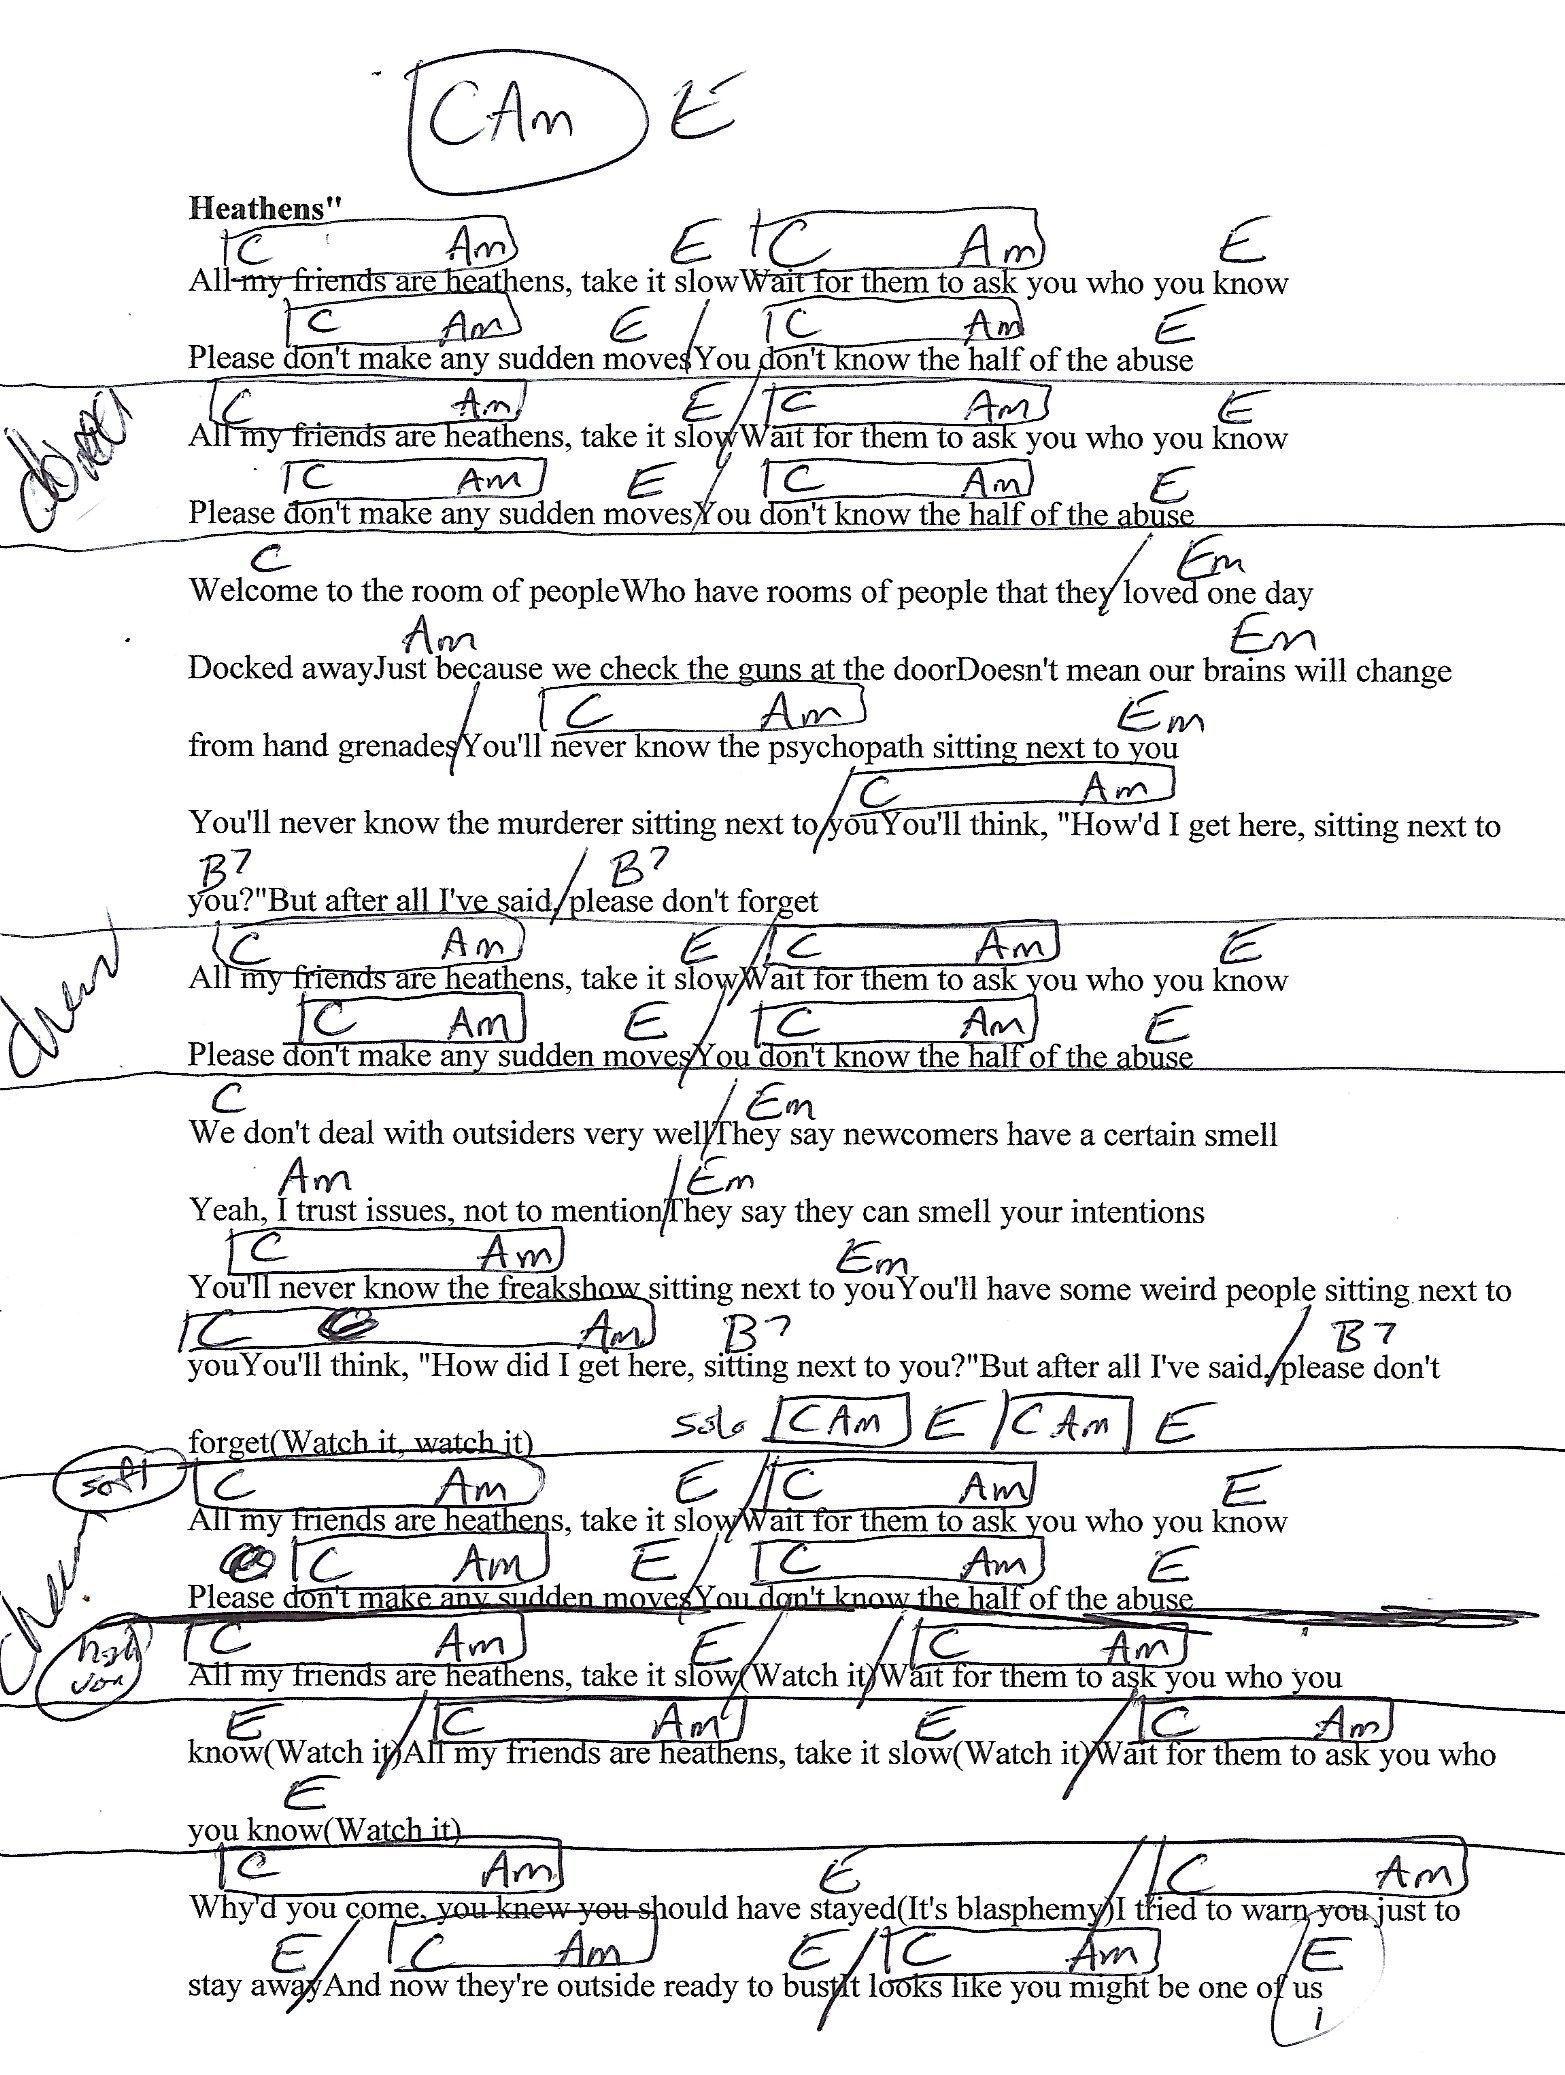 Heathens Twenty One Pilots Guitar Lesson Chord Chart With Lyrics